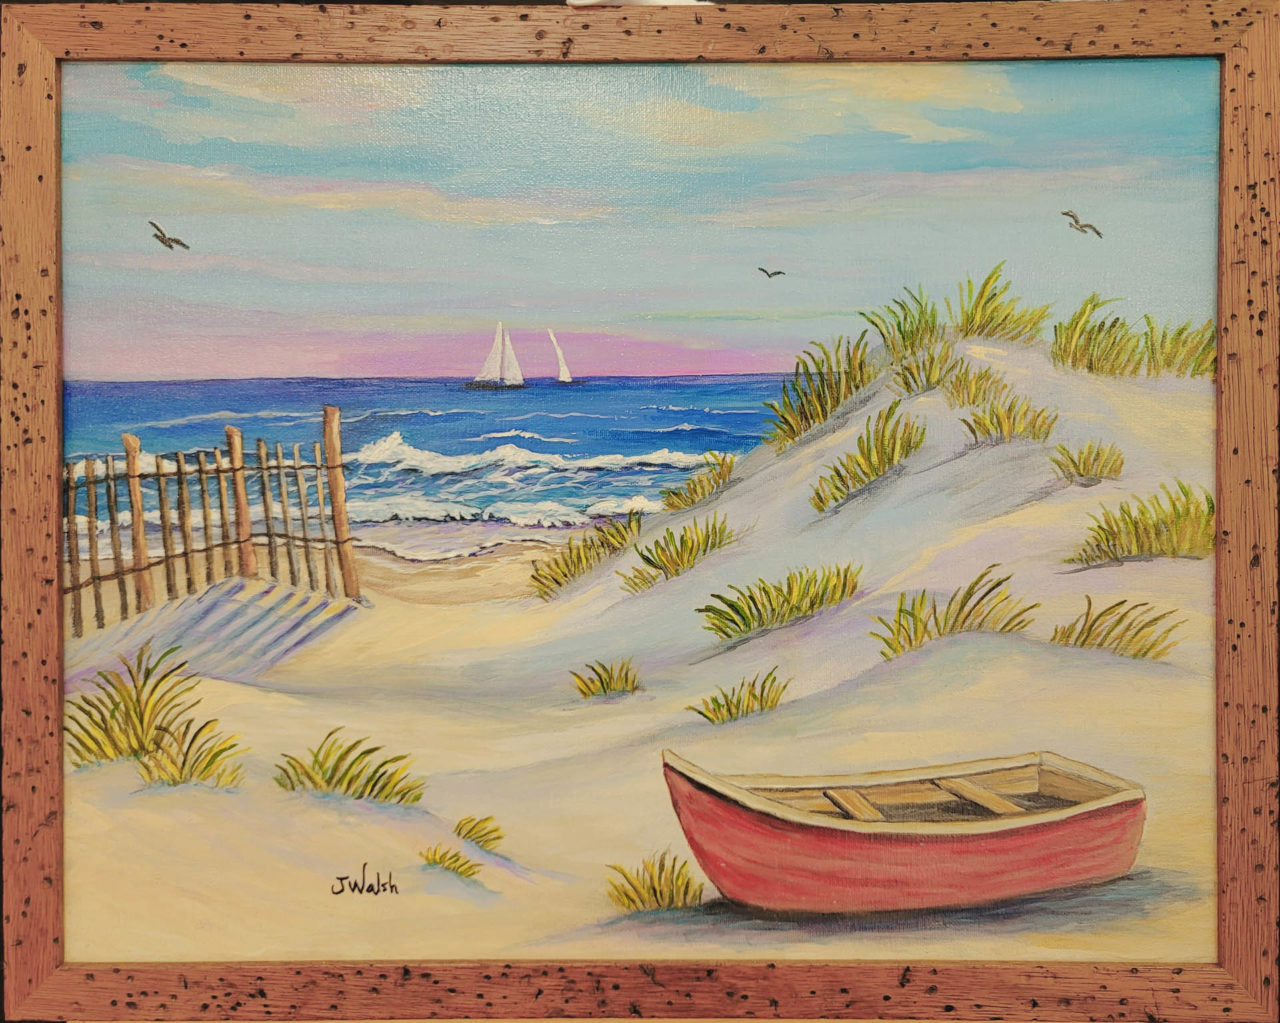 Sailing Near the Dunes - Judy Walsh